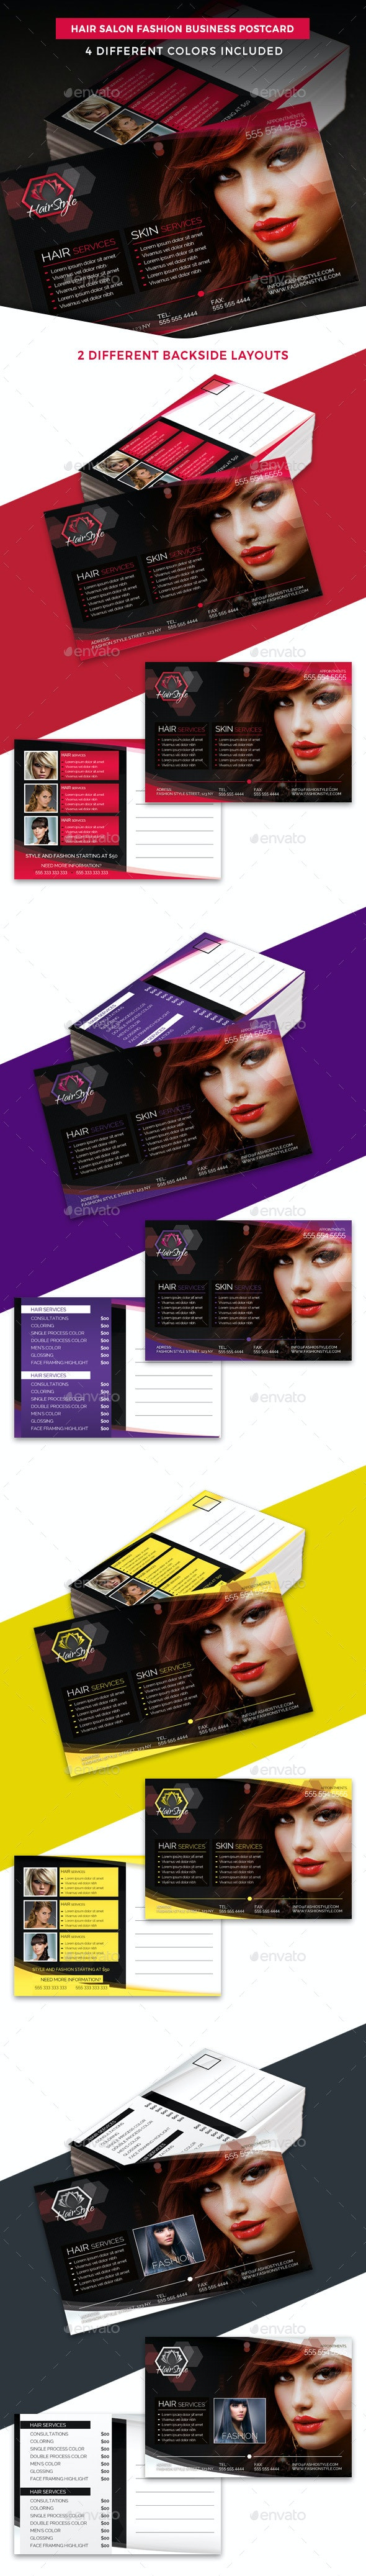 Hair Salon Fashion Business Postcard Template - Cards & Invites Print Templates